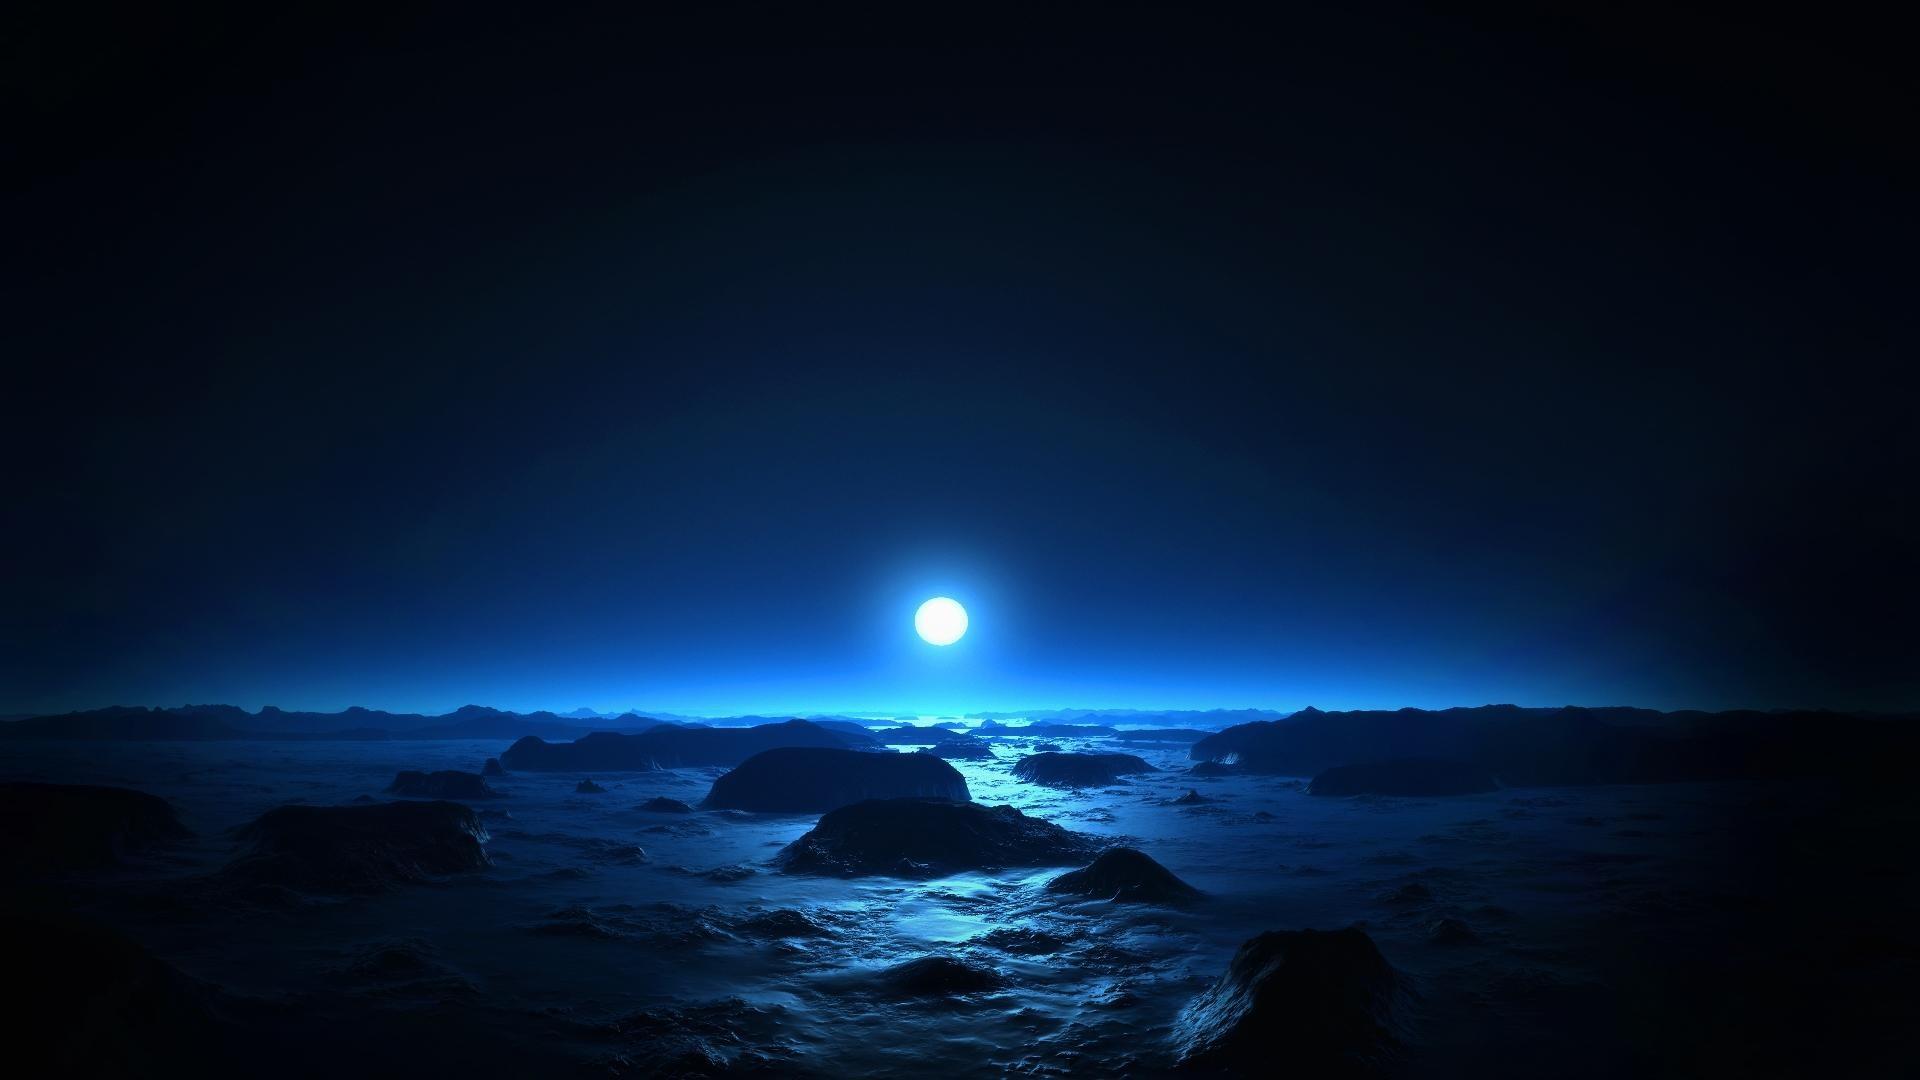 Blue Moonshine, Desktop Wallpaper